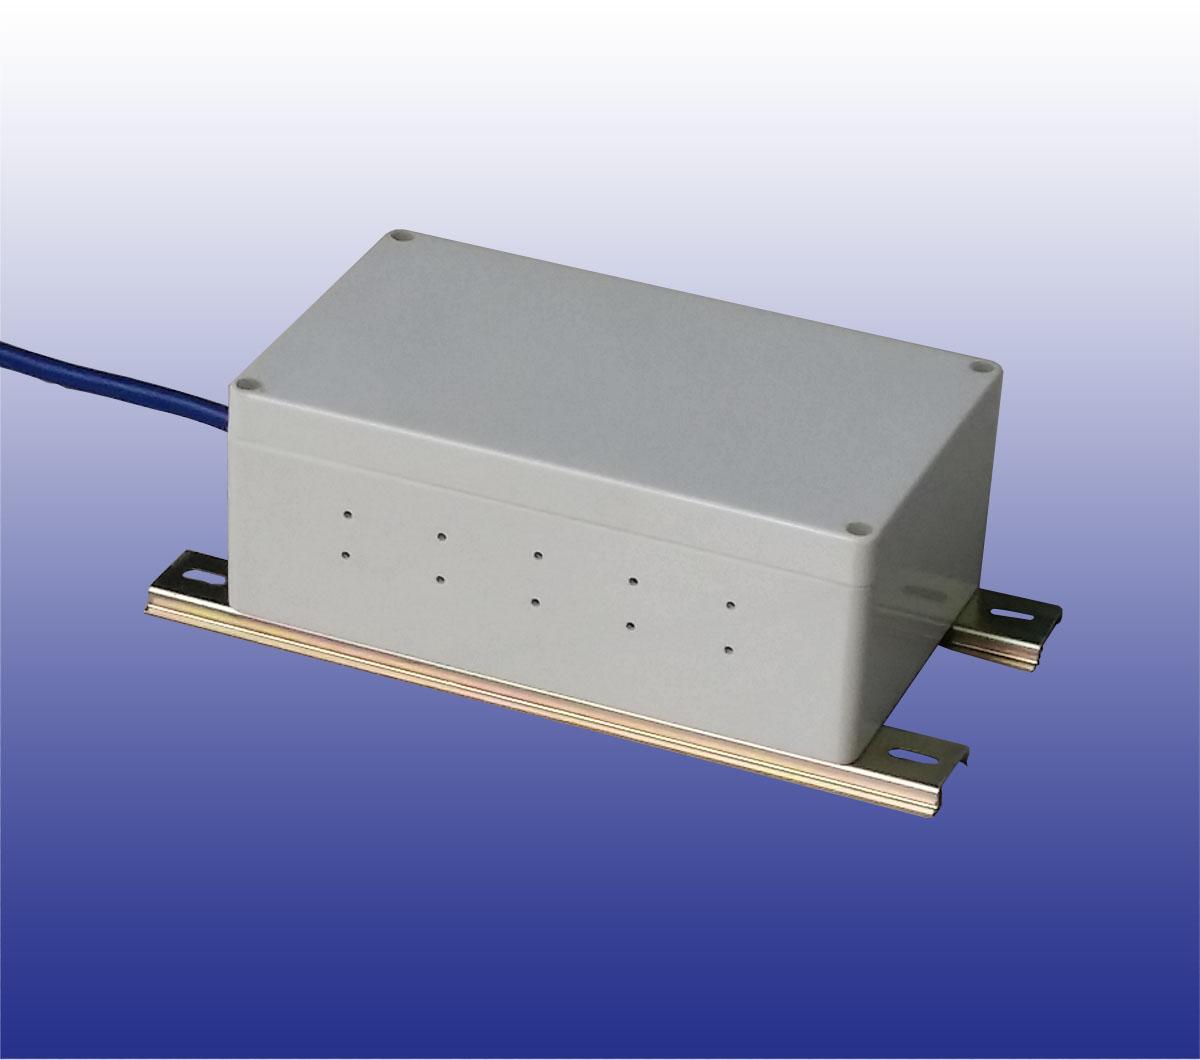 vwp型振弦式气压计适用于长期监测观测点的图片